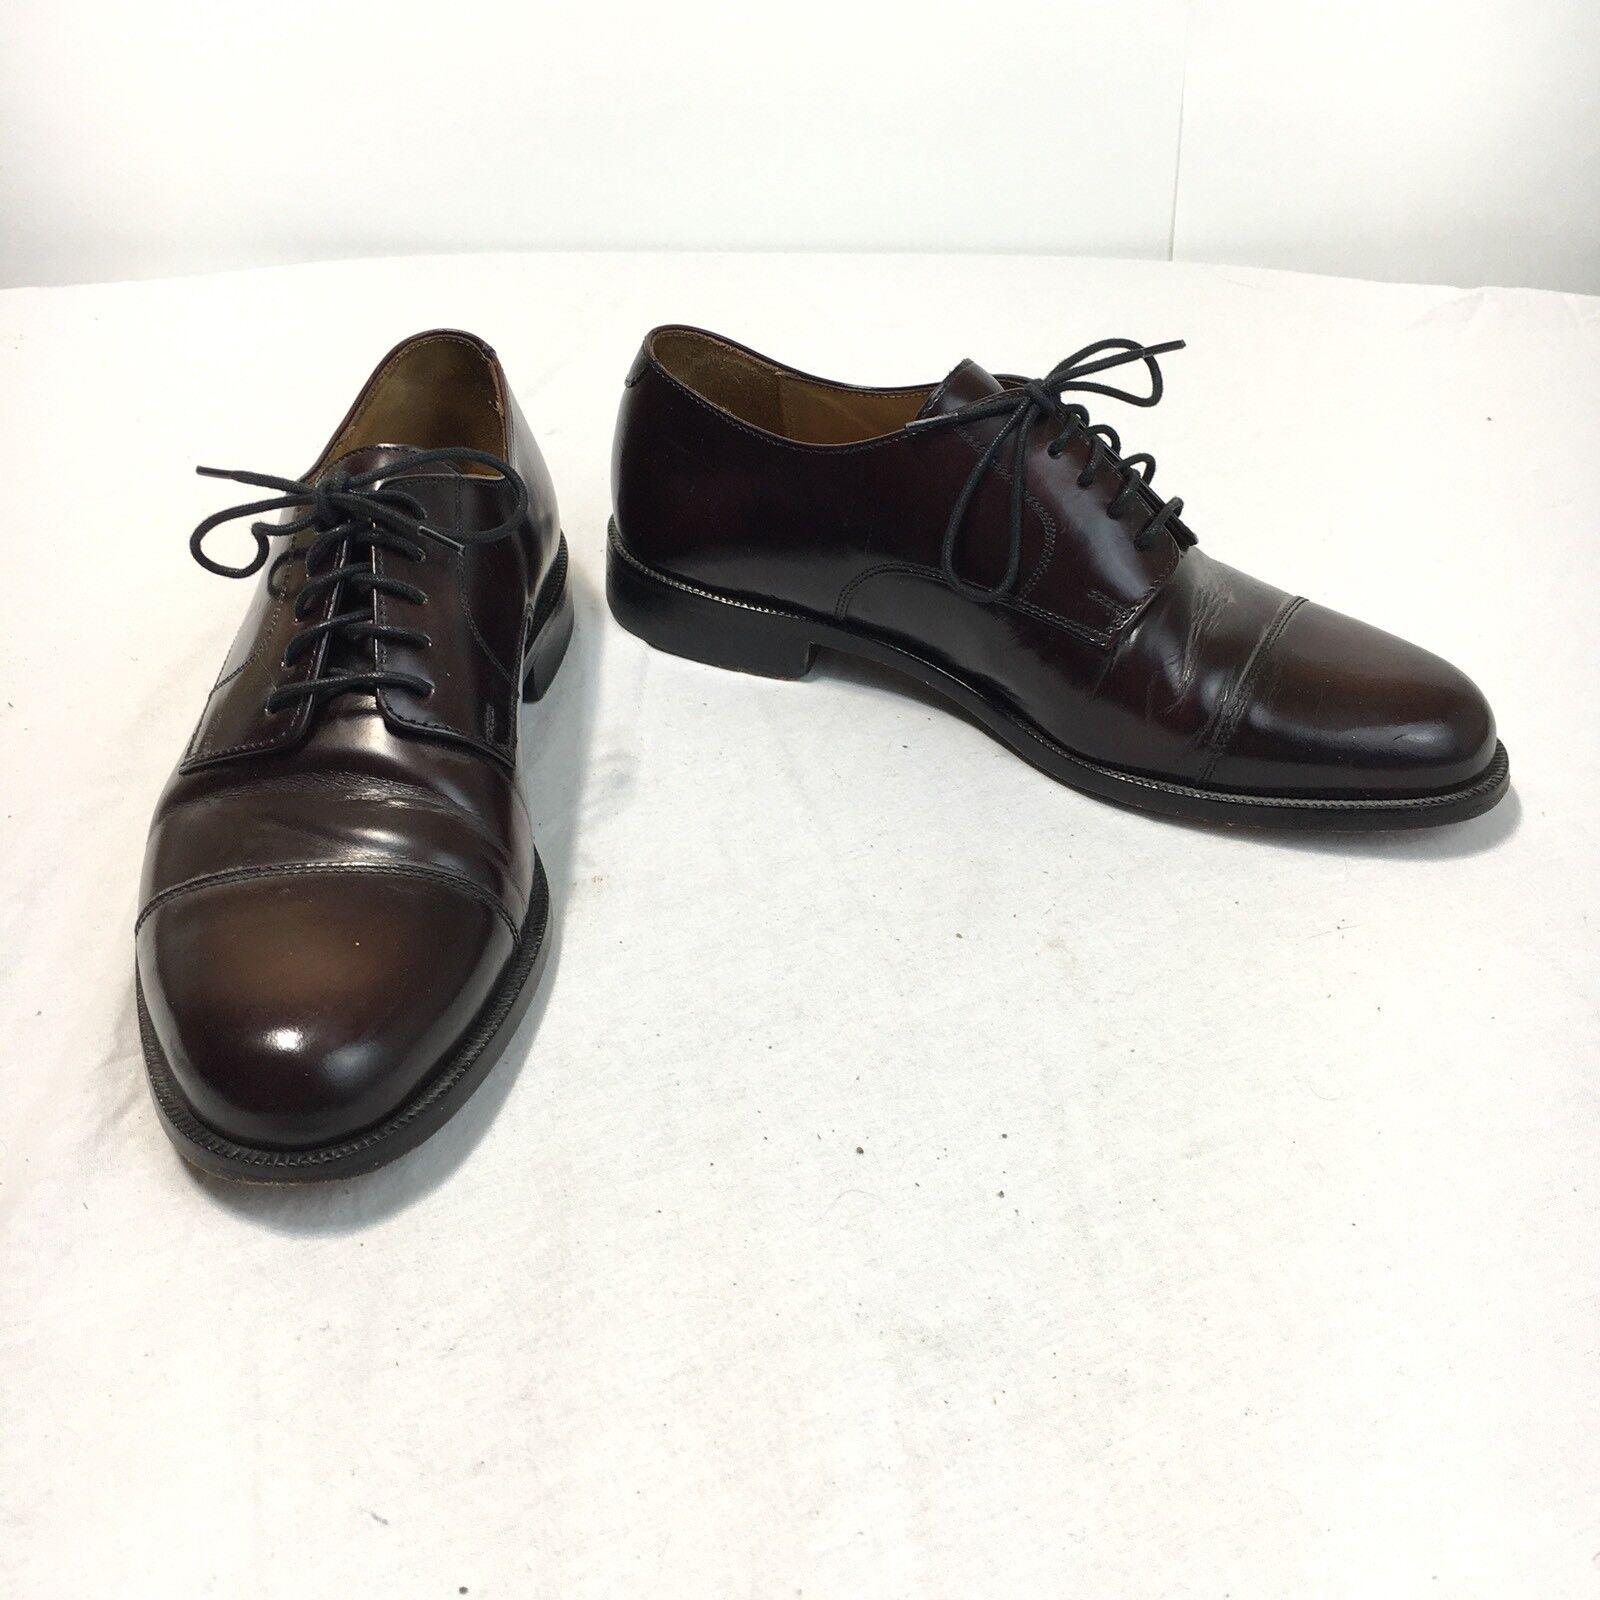 Cole Haan Men's 8.5 D Dark Burgundy Leather Cap Toe Lace Up Oxford Dress shoes